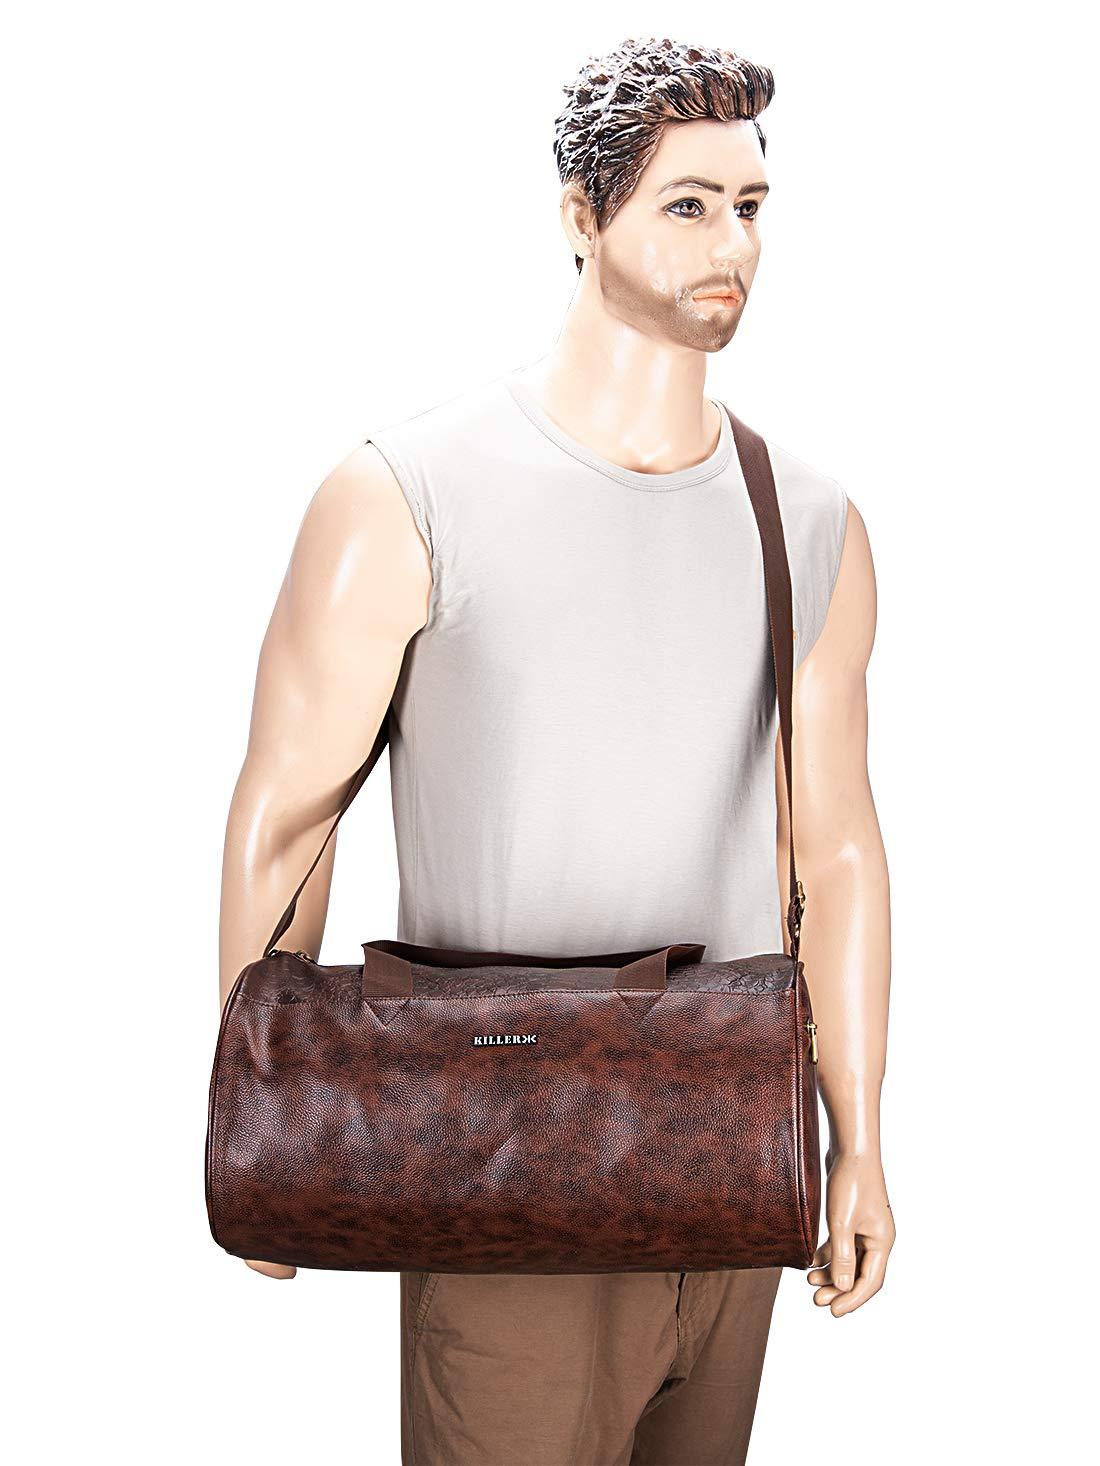 Killer best leather gym bags for men